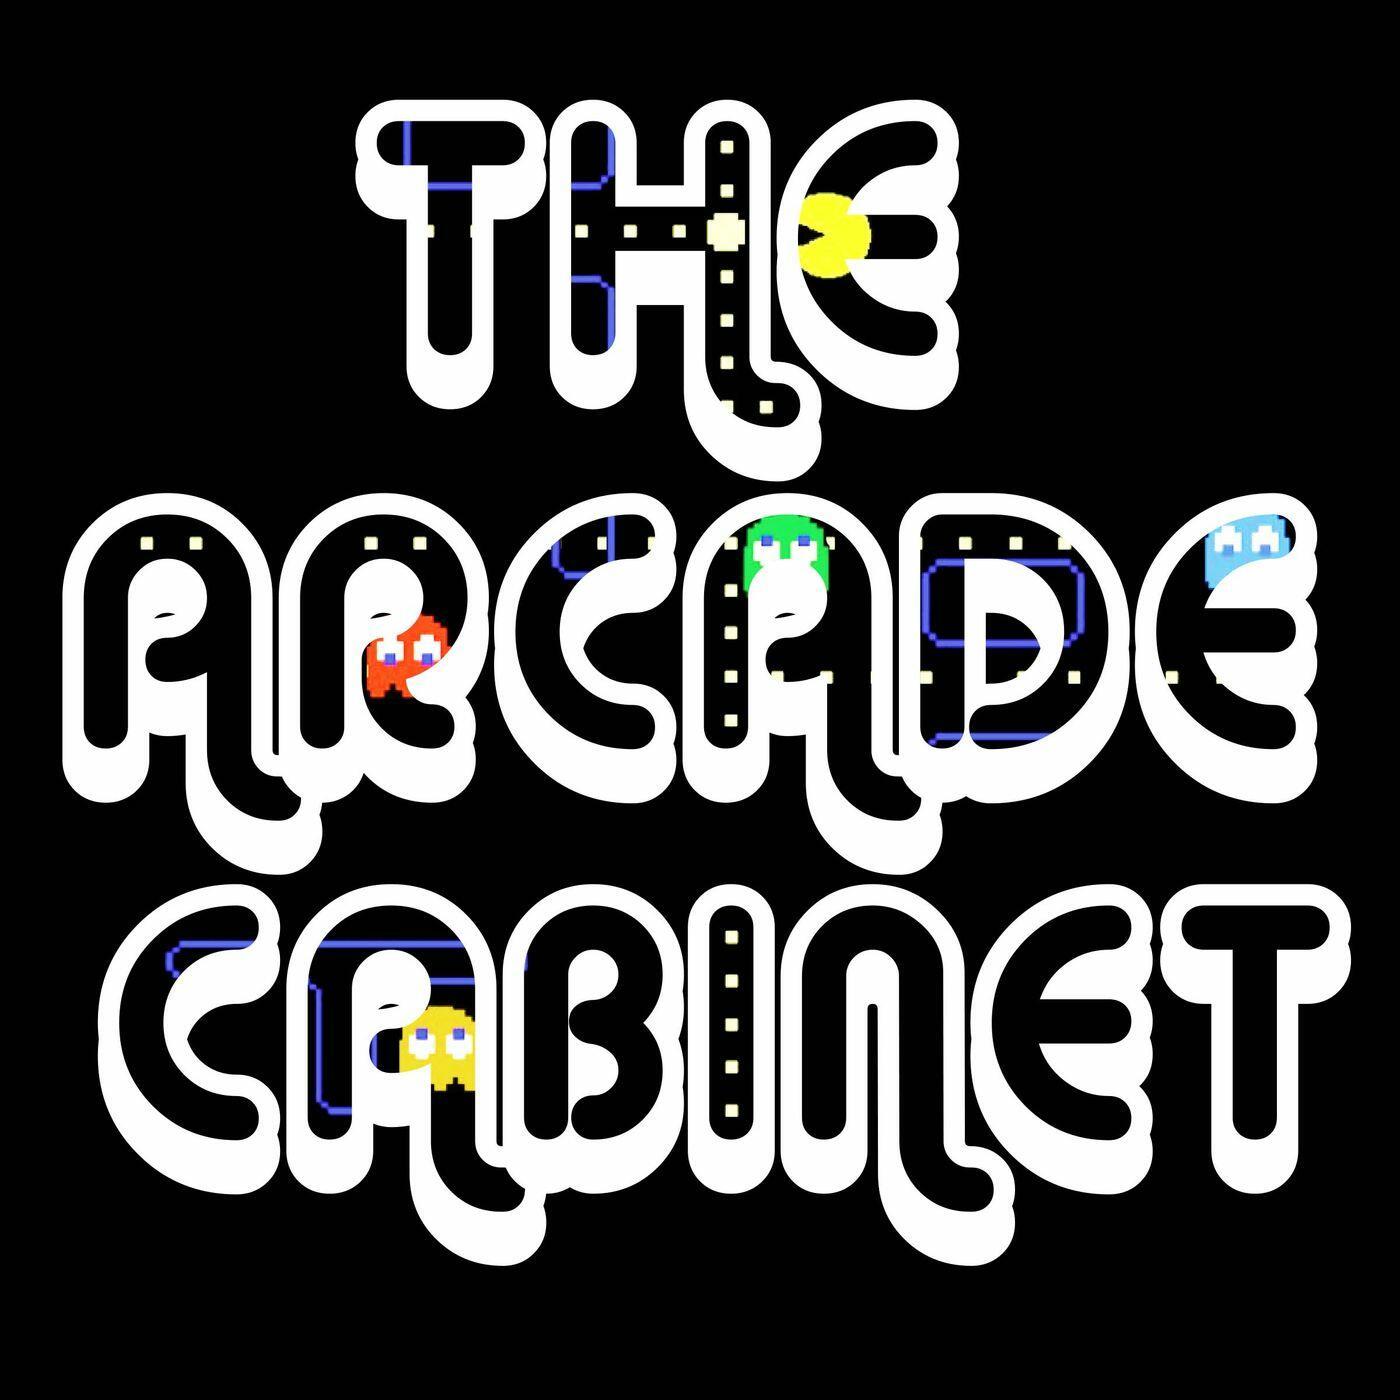 The Arcade Cabinet